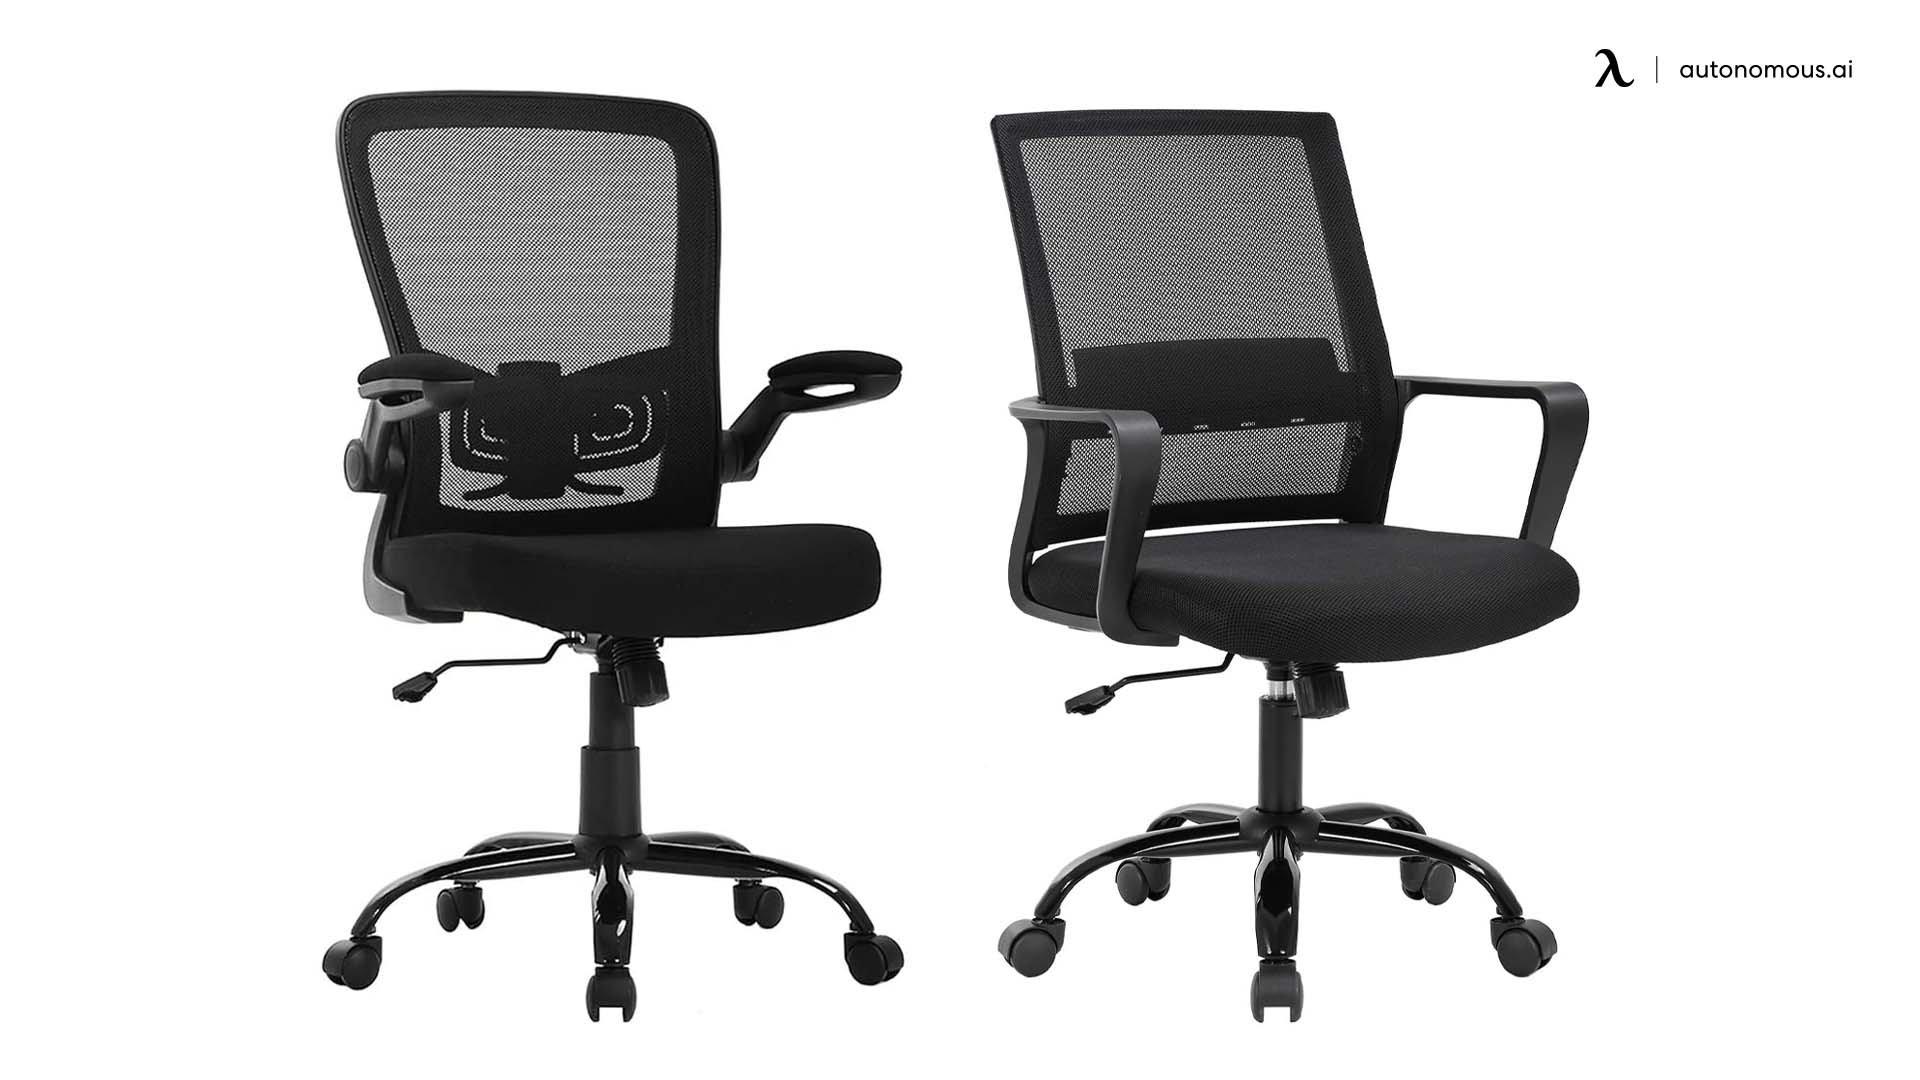 The BestOffice Ergonomic Desk Chair